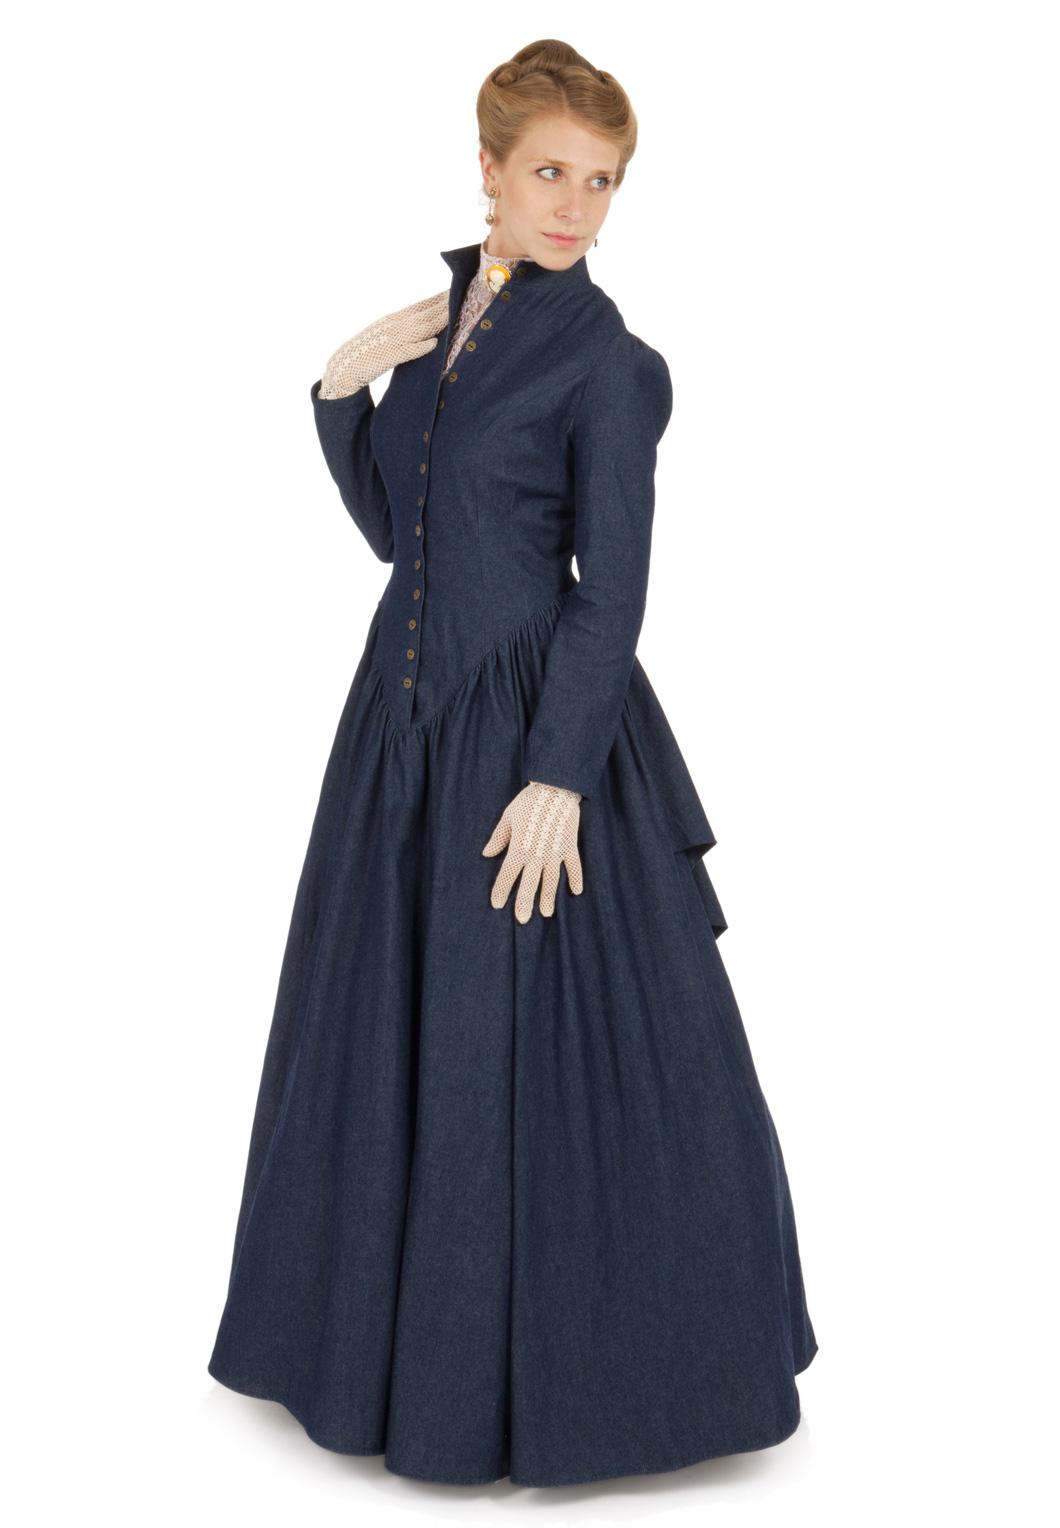 Retta Victorian Dress | Recollections